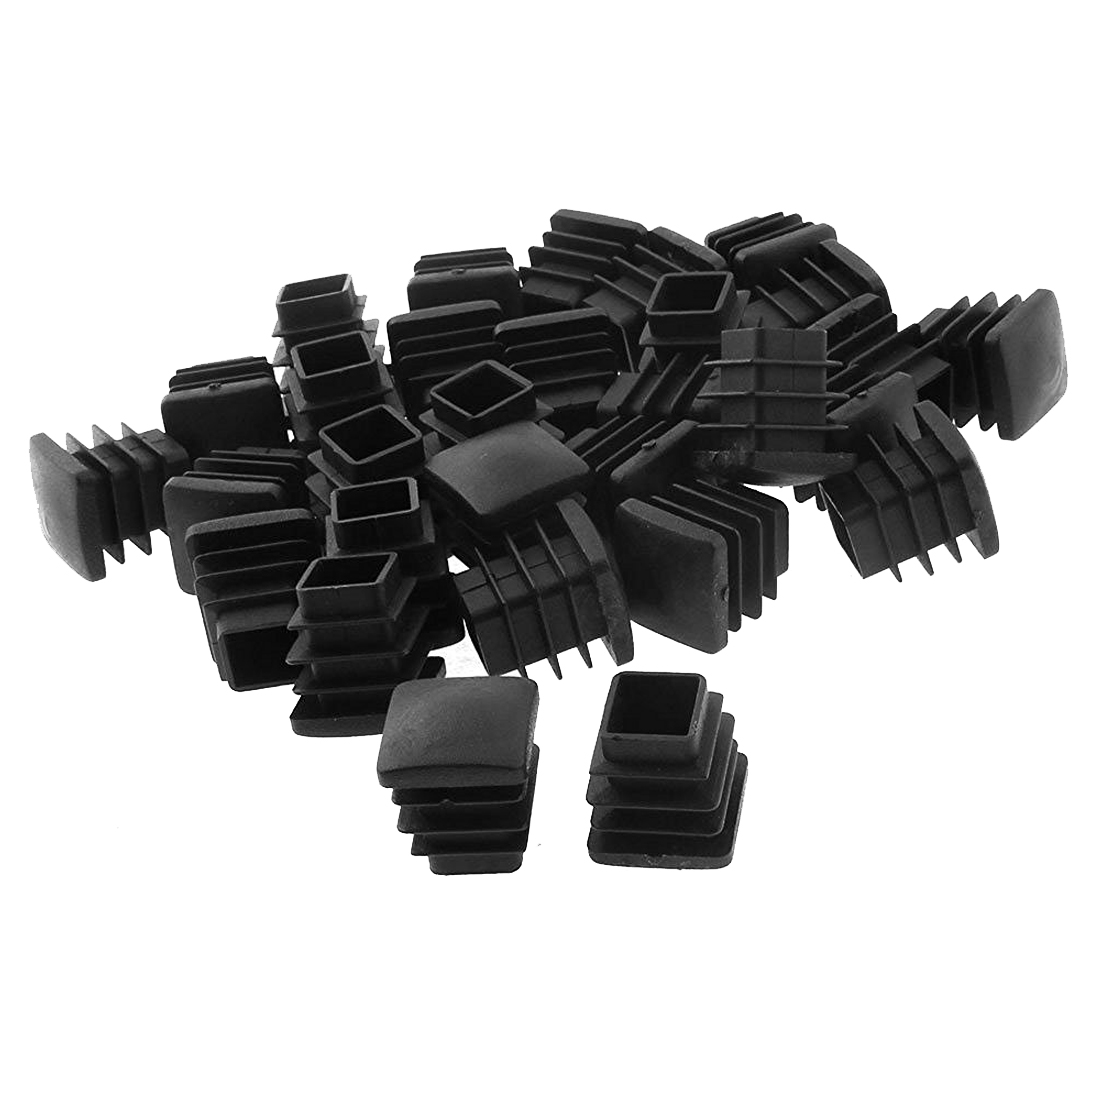 Square Table Chair Leg Feet Tube Pipe Insert Cap 16mmx16mm 30pcs Black